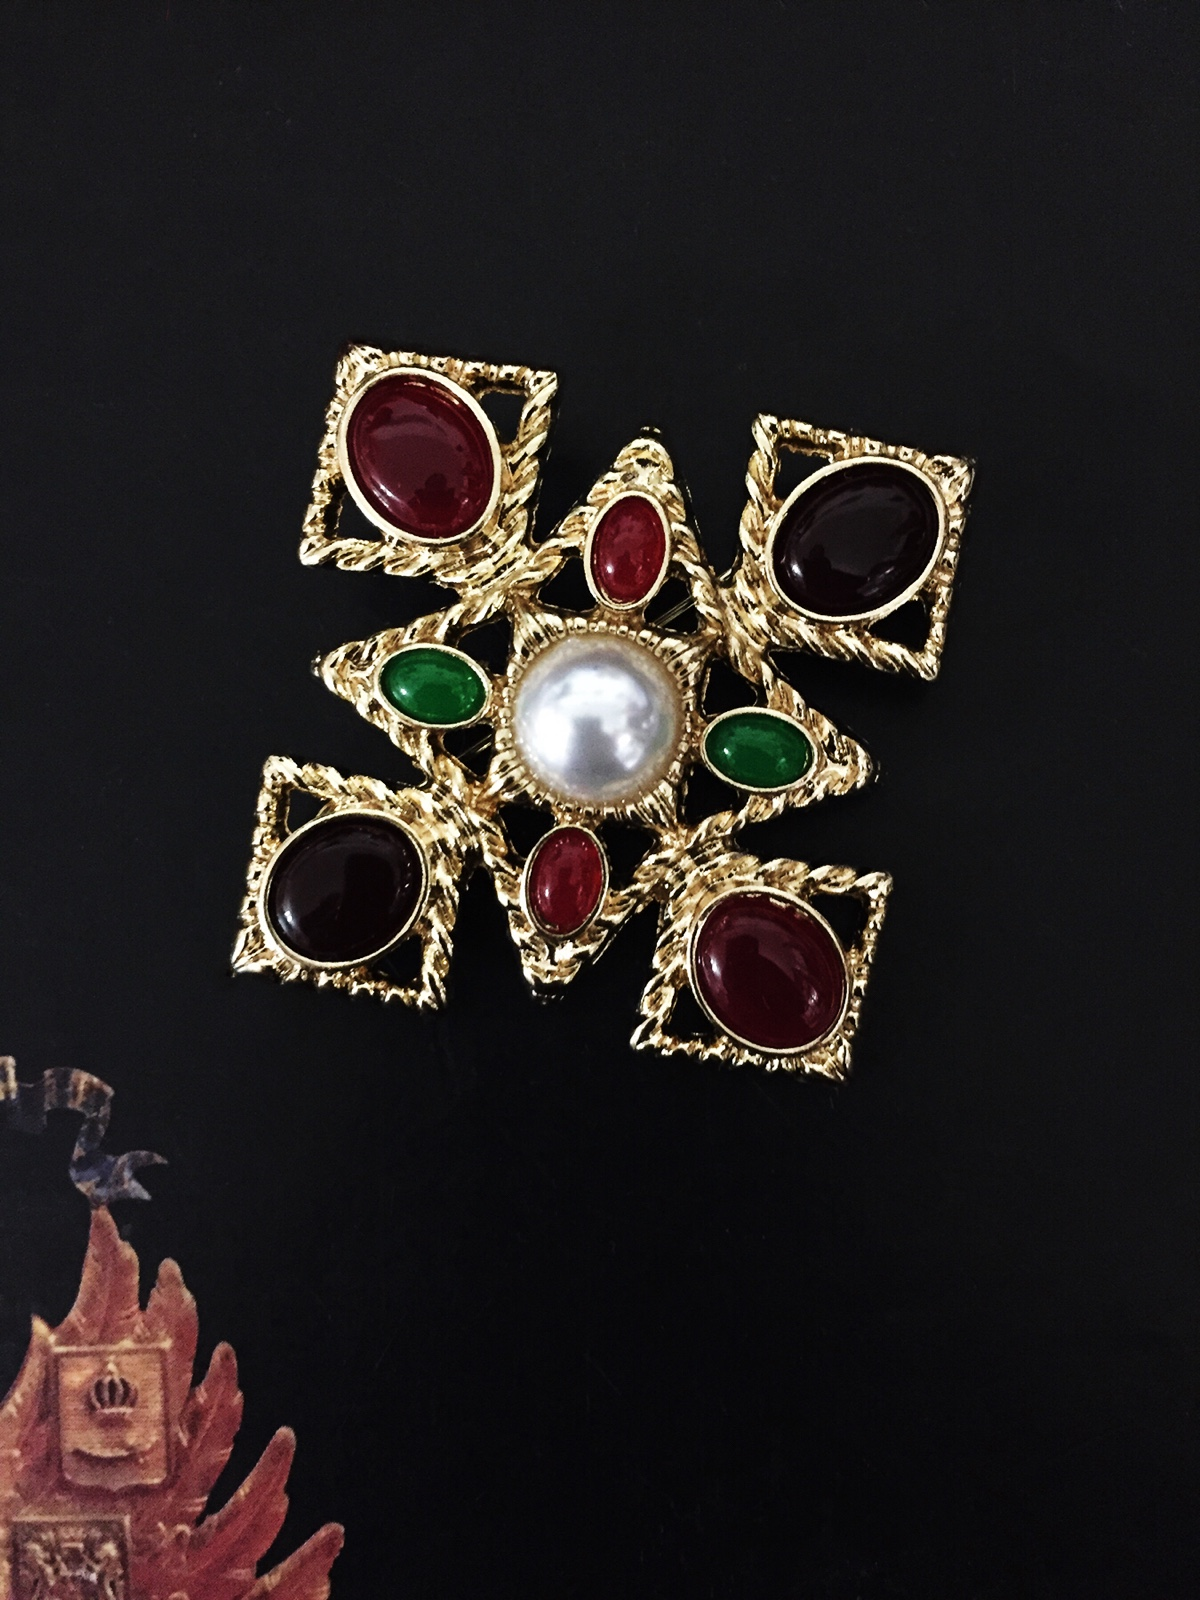 European retro court style Byzantine Baroque Ruby green pearl brooch brooch brooch brooch brooch female